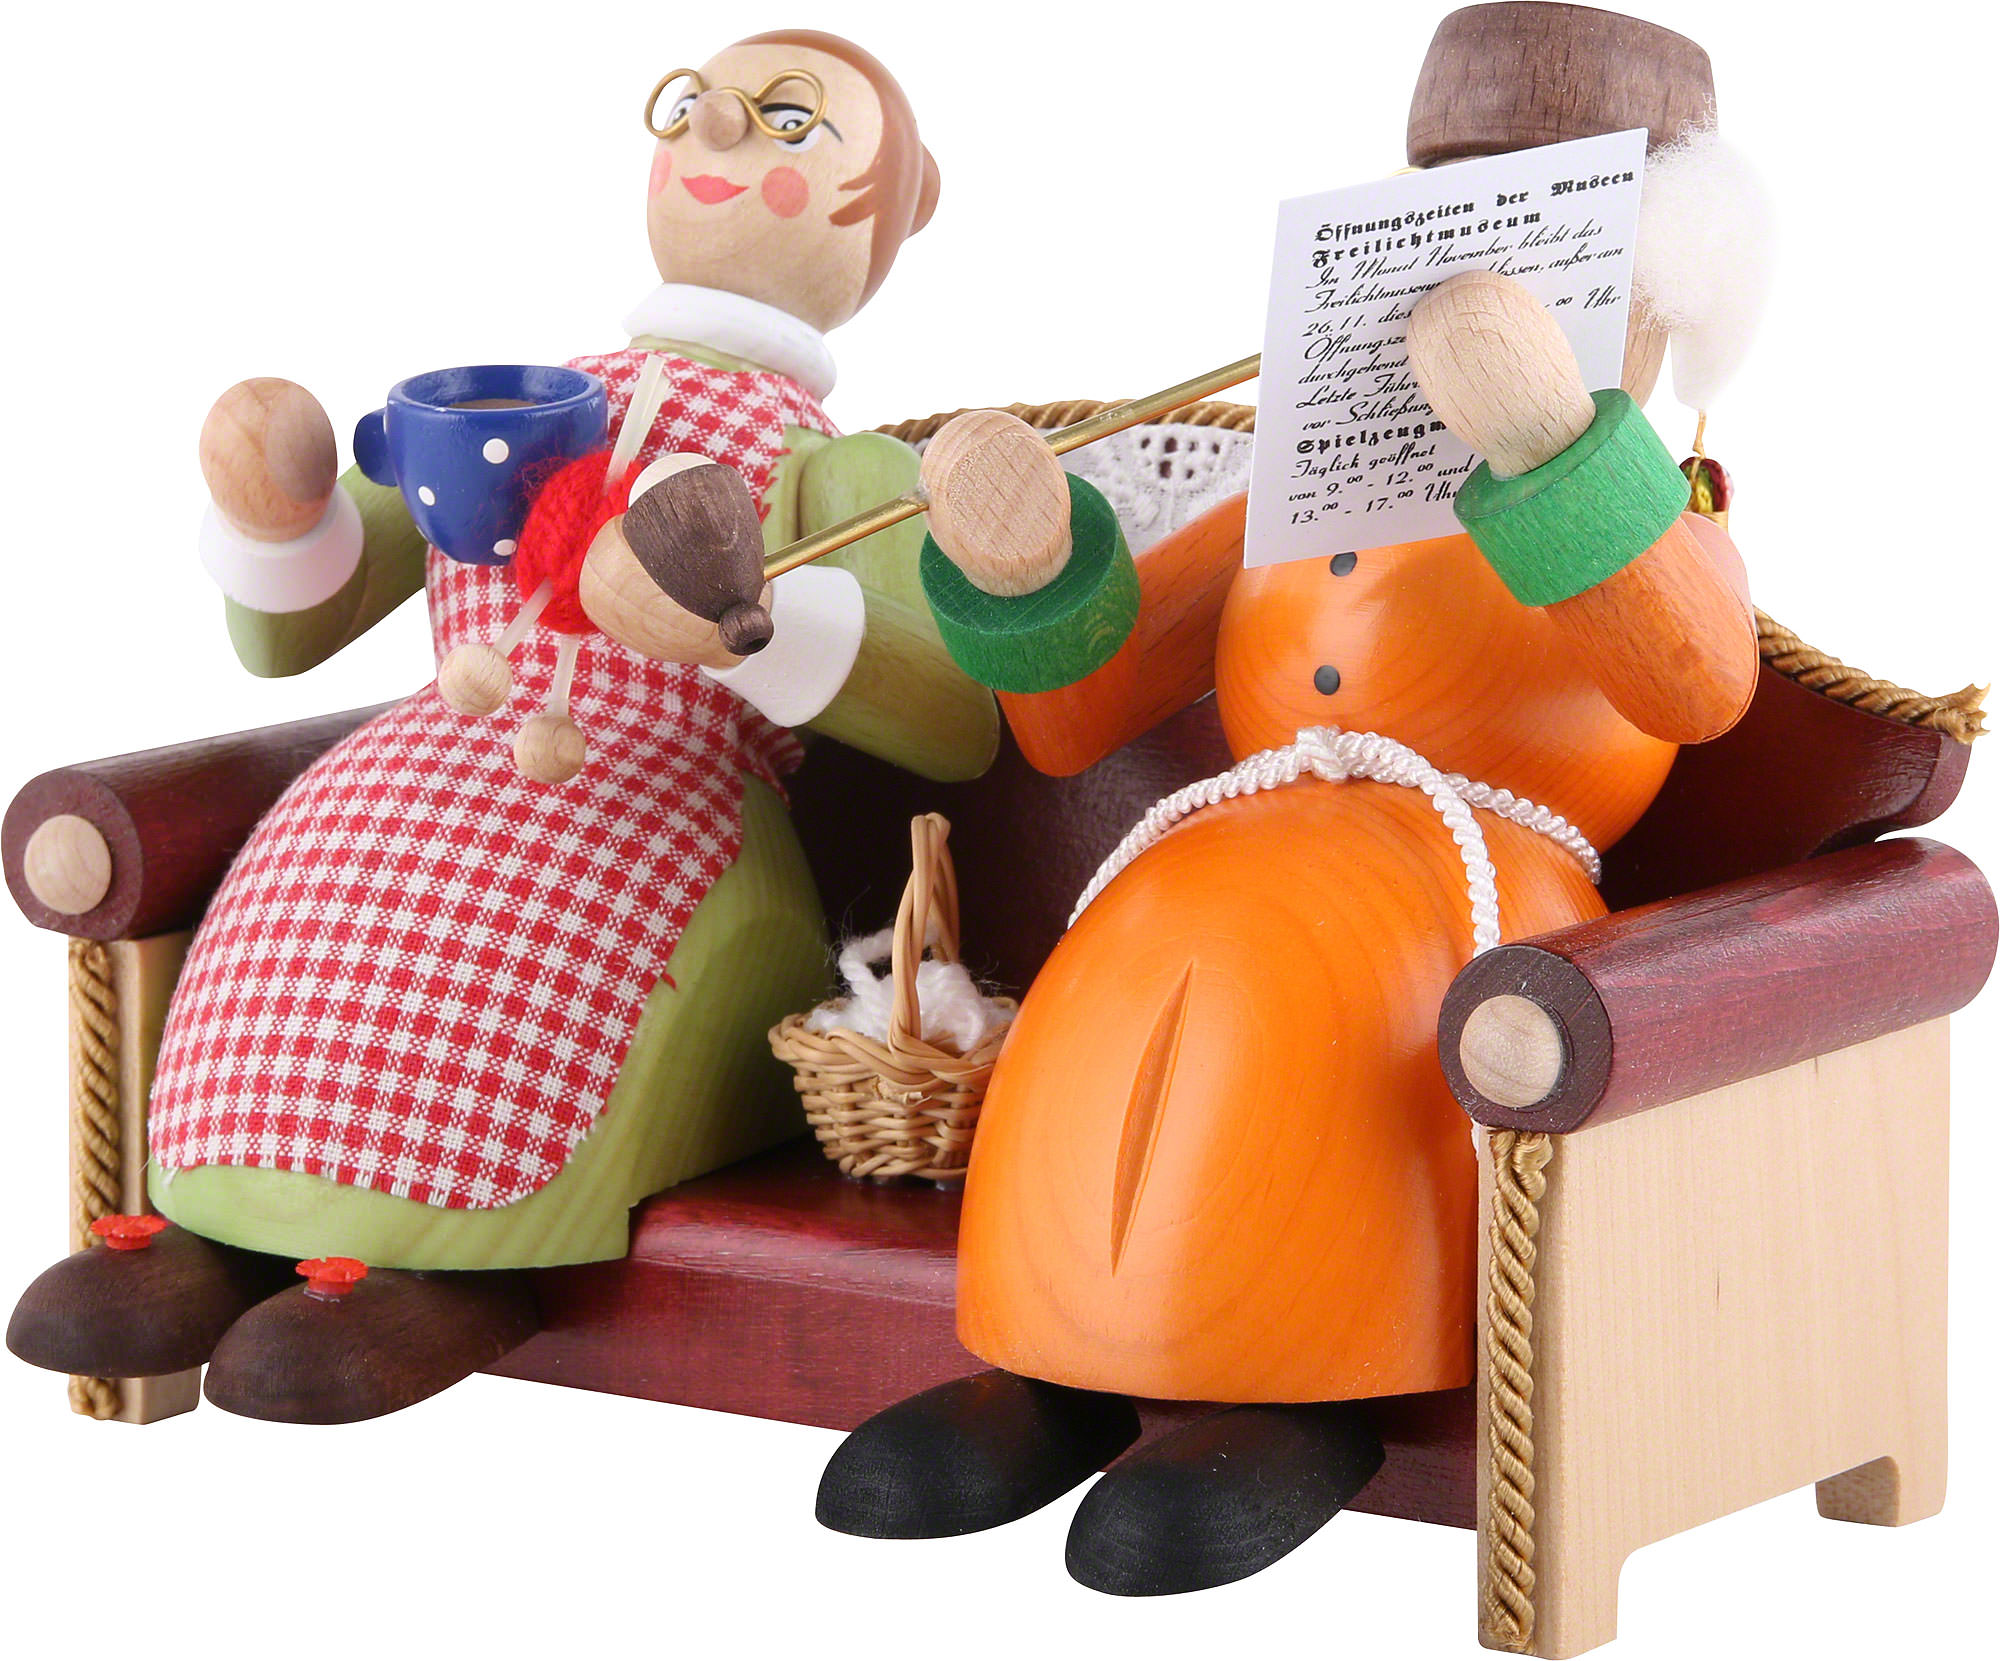 Oma auf dem Leder Sofa gebumst